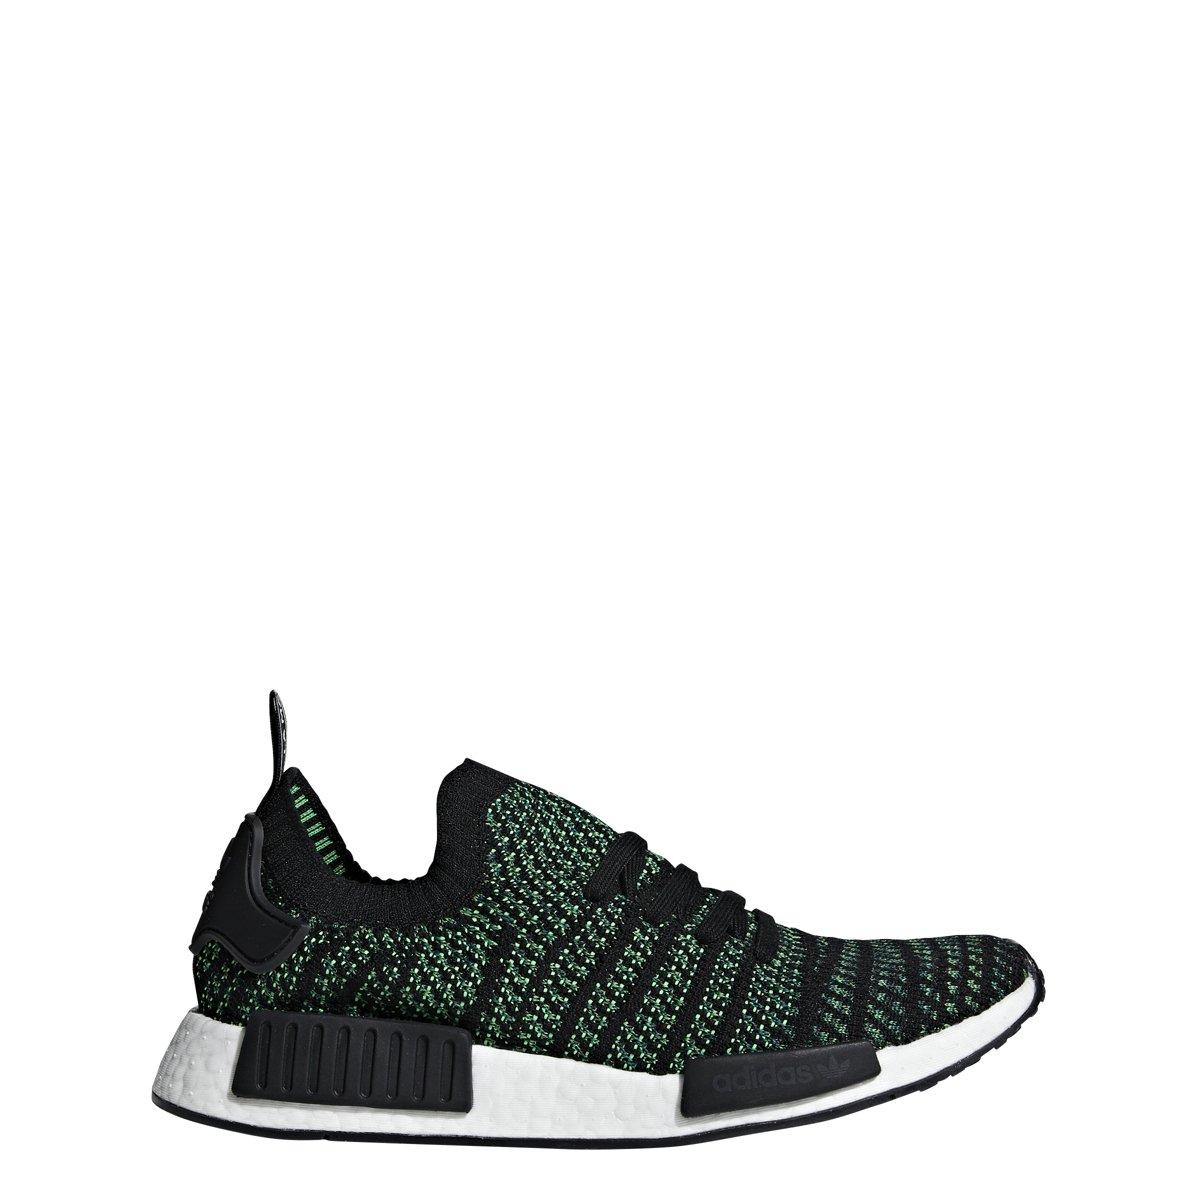 Black-Noble Green-Bold Green adidas Originals NMD_R1 Primeknit shoes Men's Casual